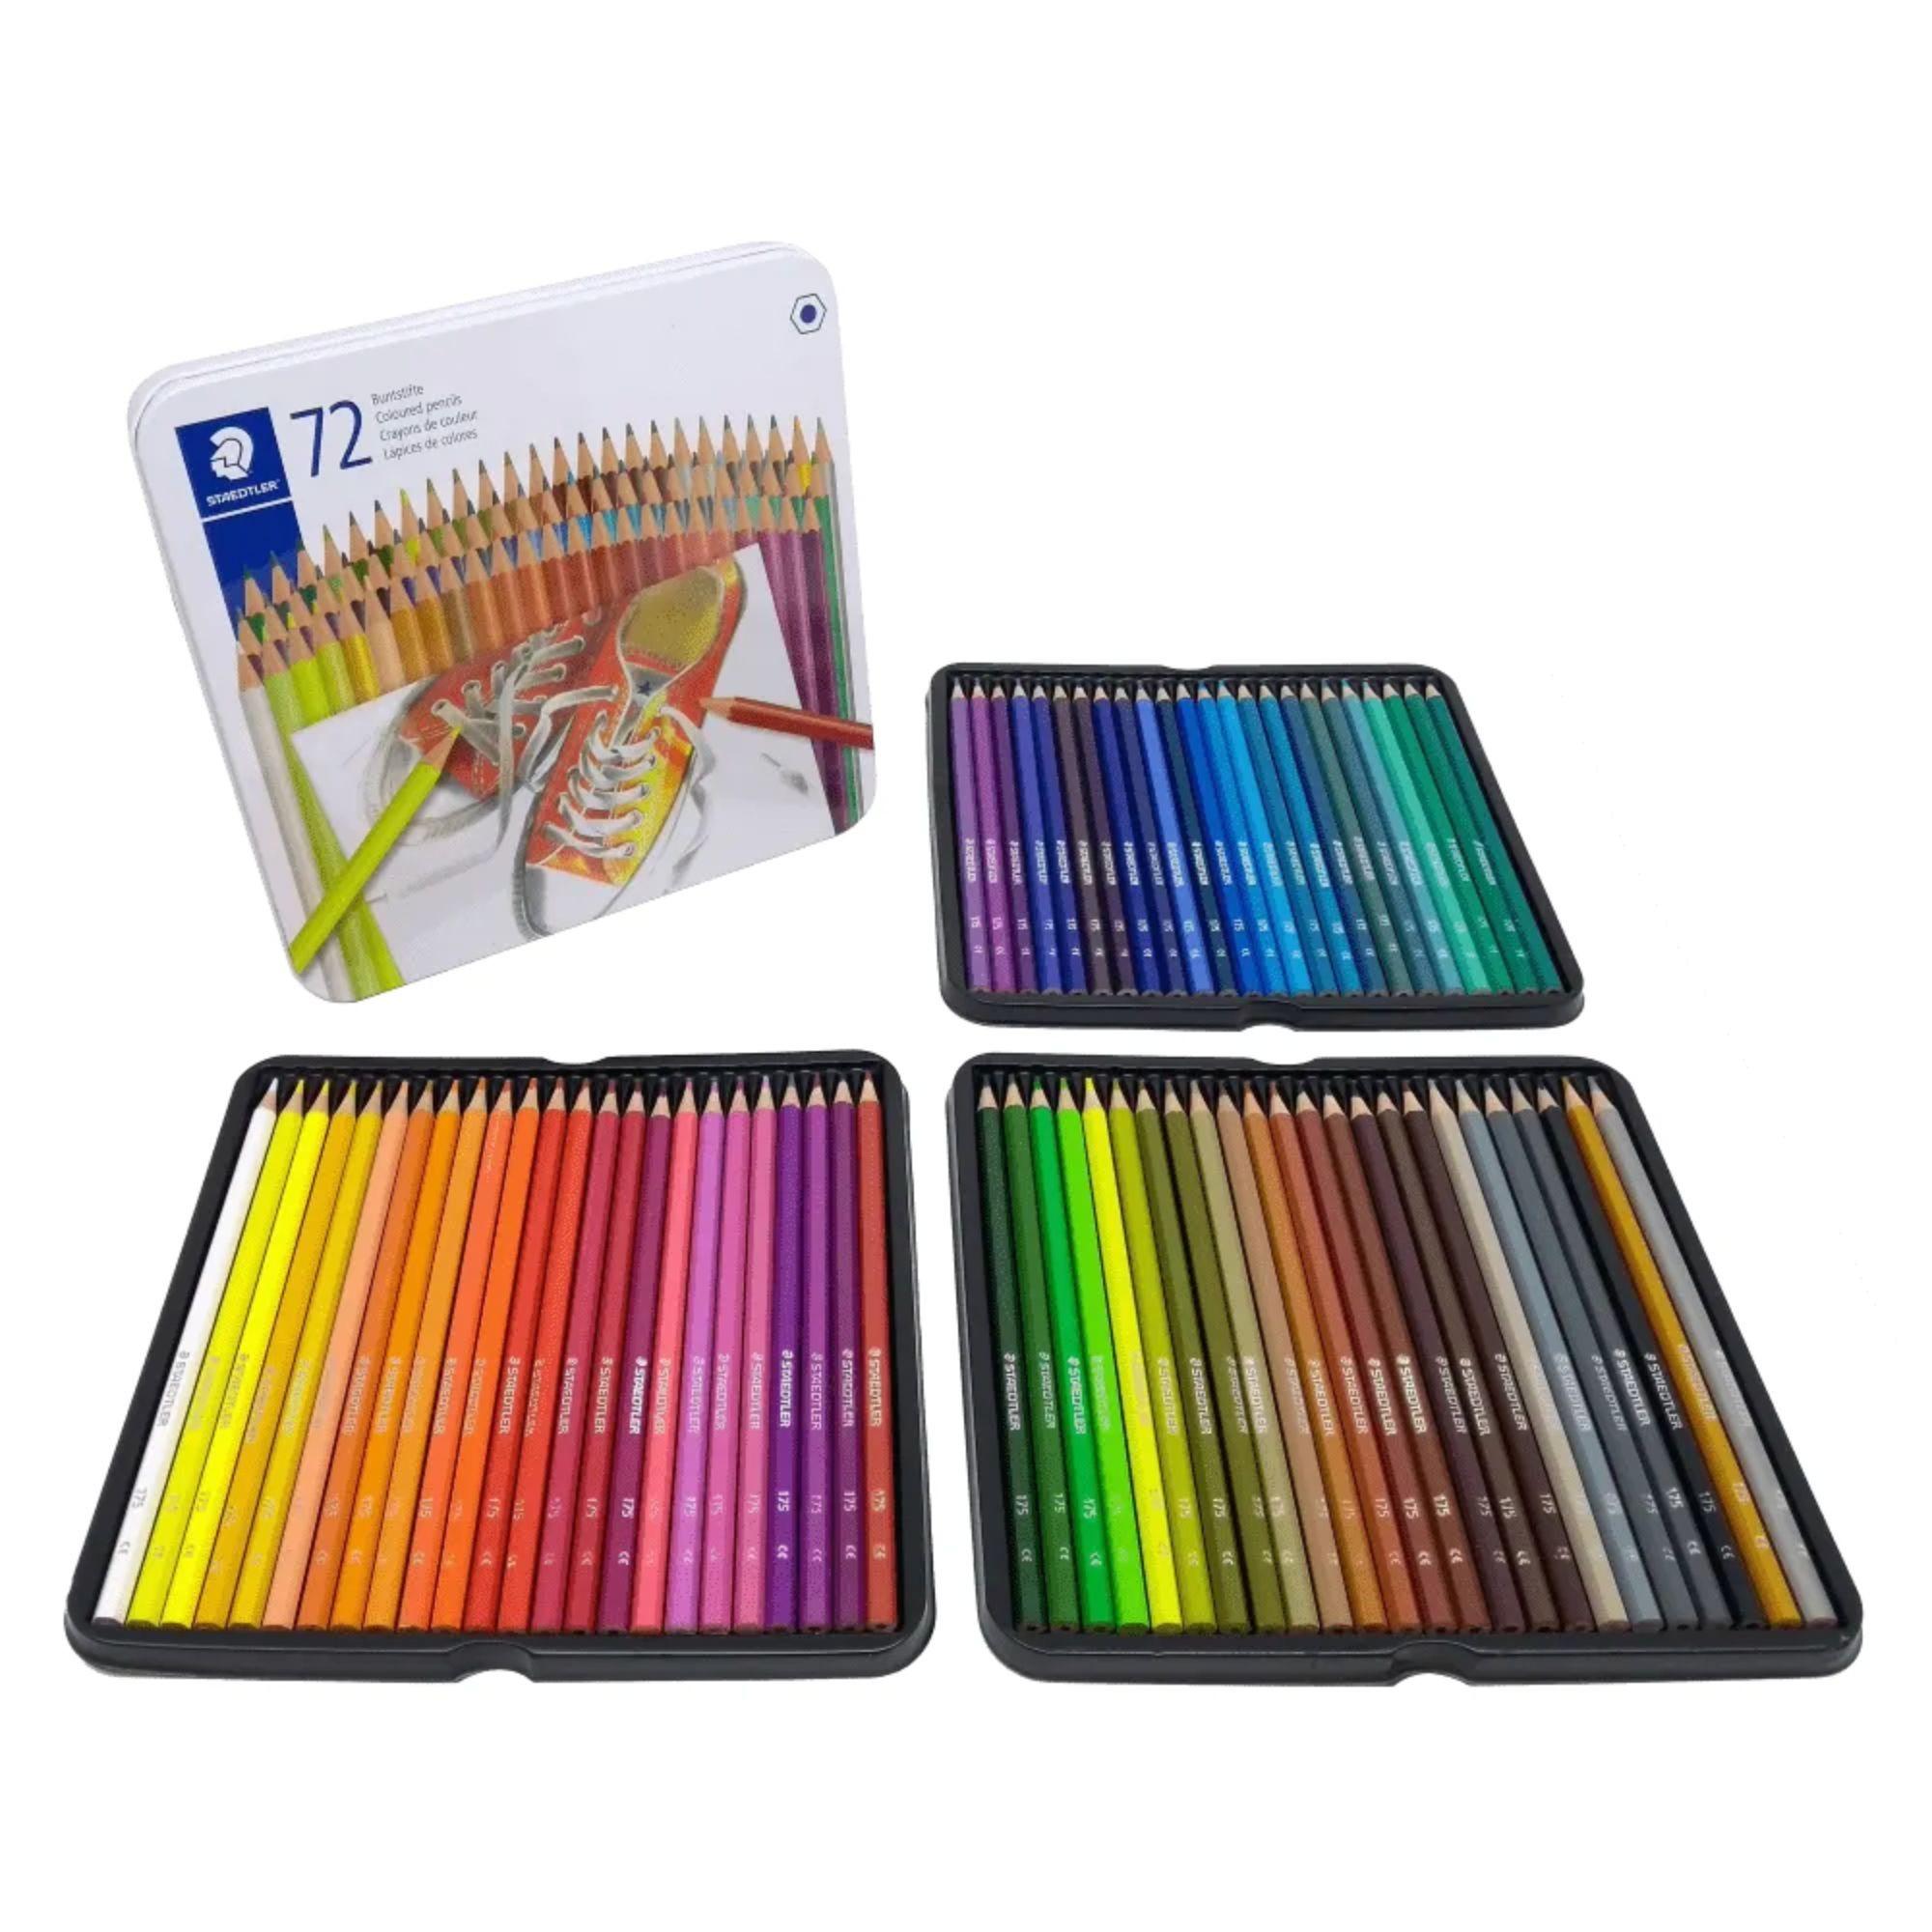 Lápis de Cor 72 cores Estojo Lata   Staedtler